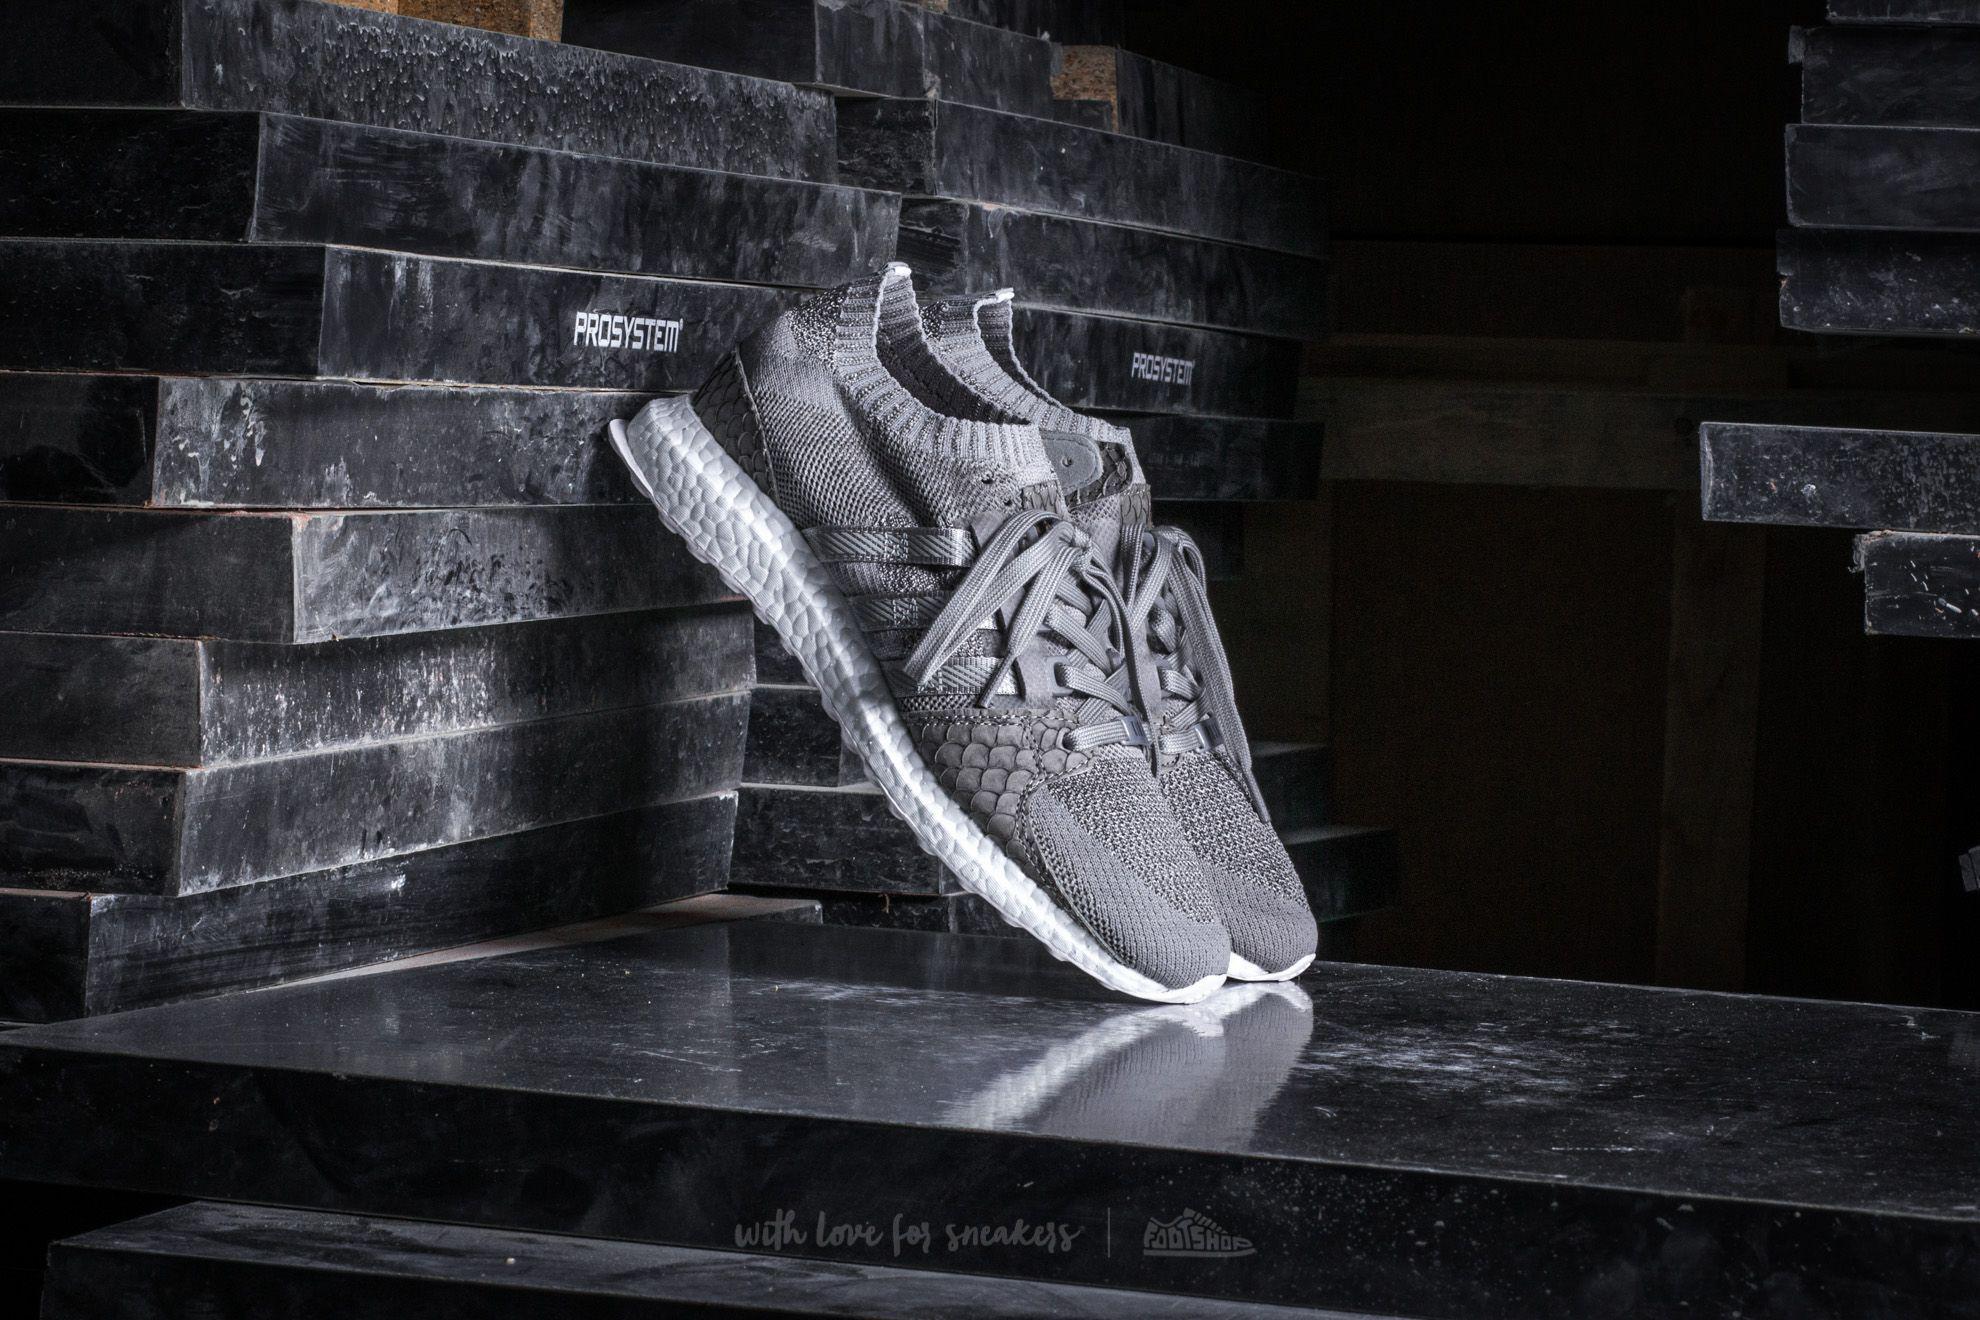 new arrival bf0c8 ac9e0 Lyst - adidas Originals Adidas X King Push Equipment Support